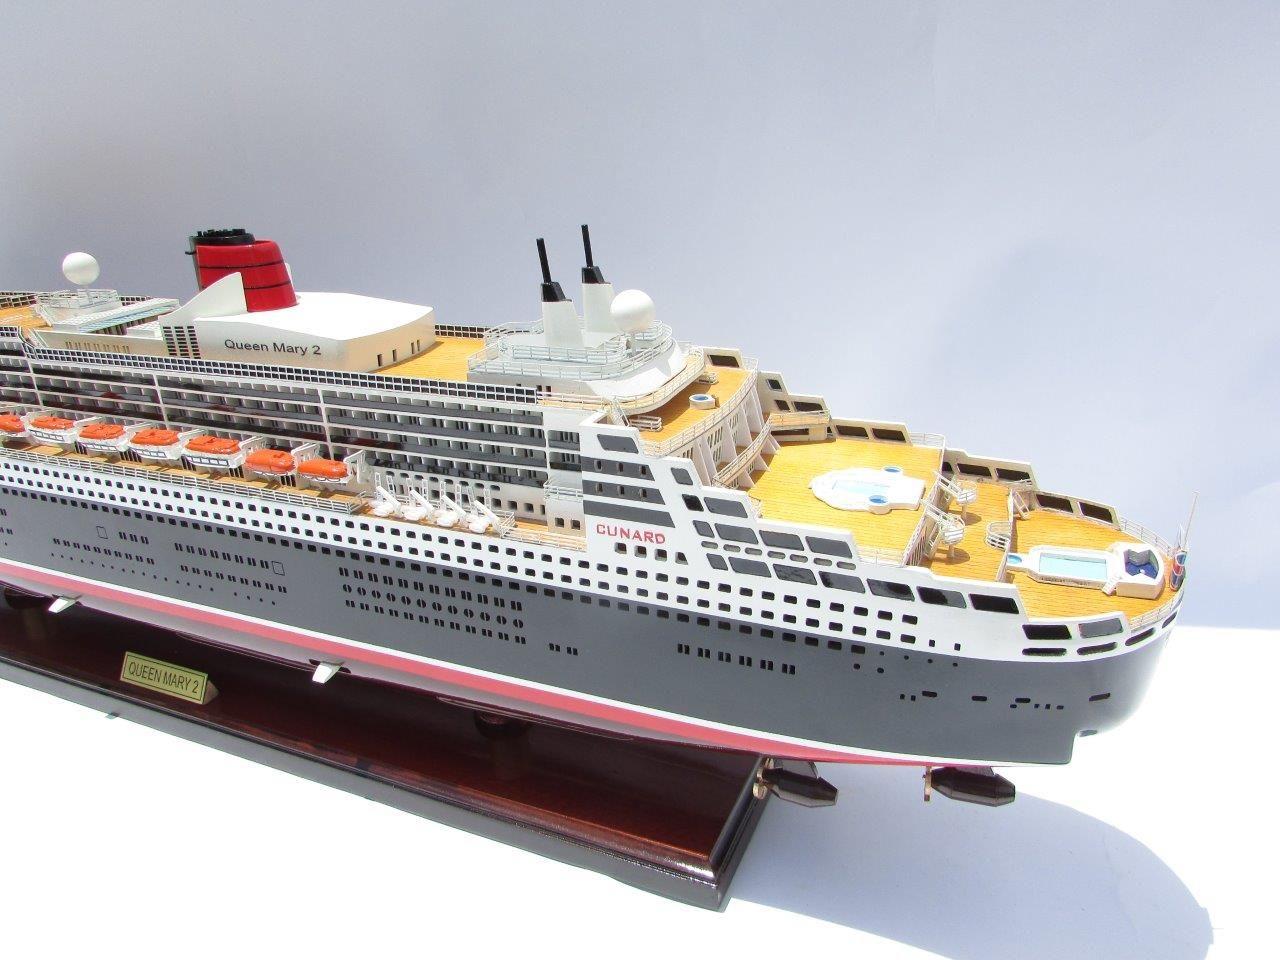 Maquette Queen Mary 2 en bois